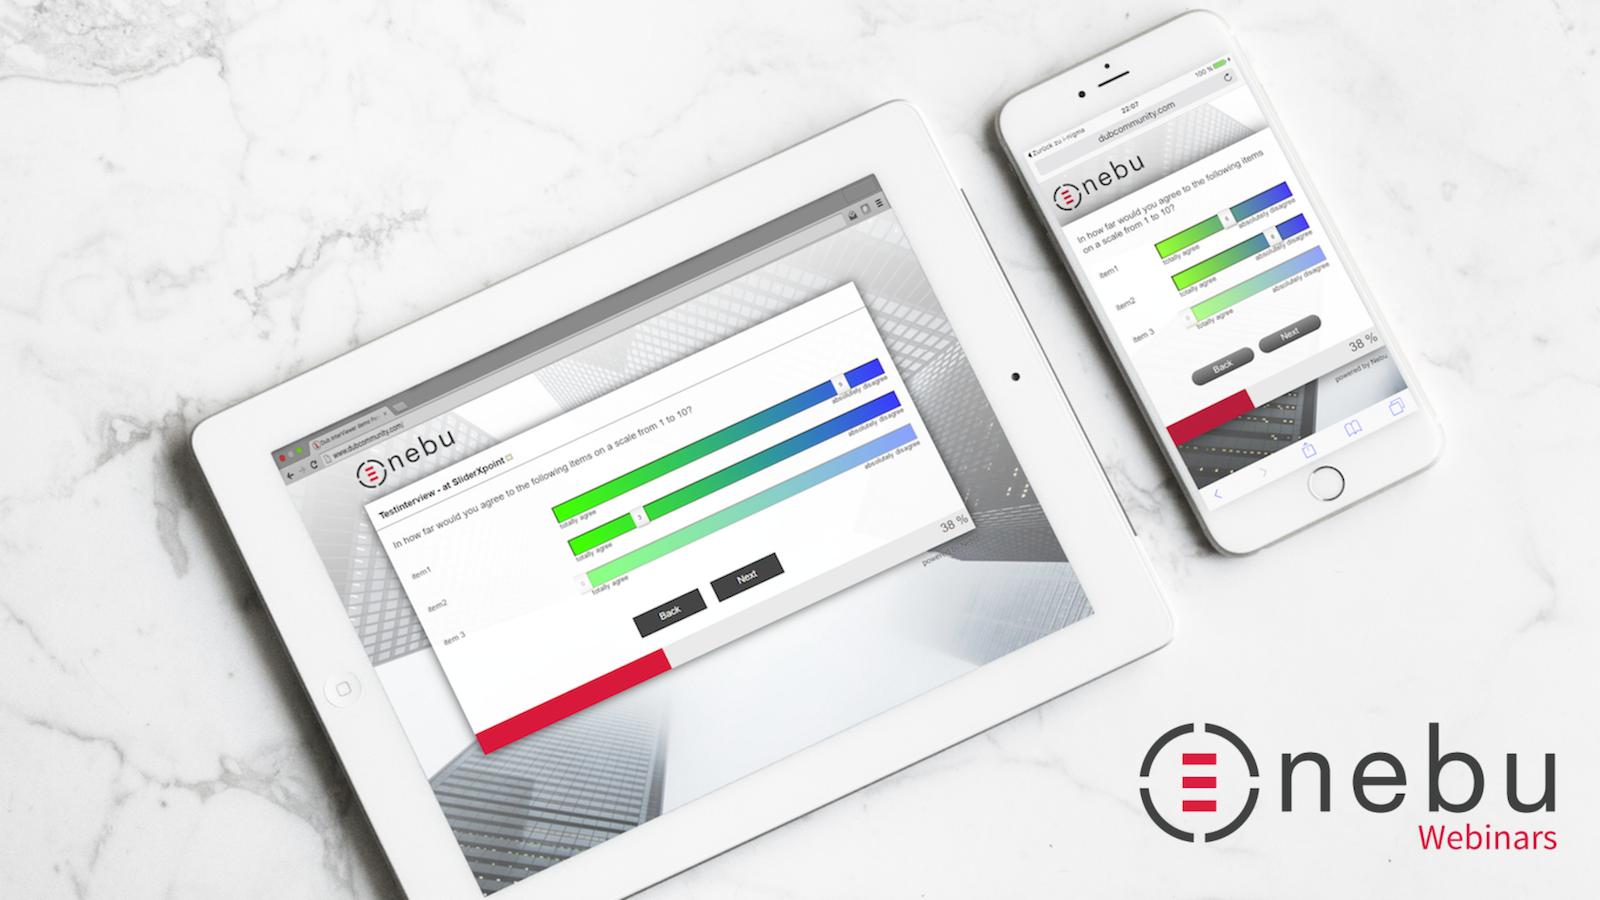 Webinar focuses on how to create award-winning surveys